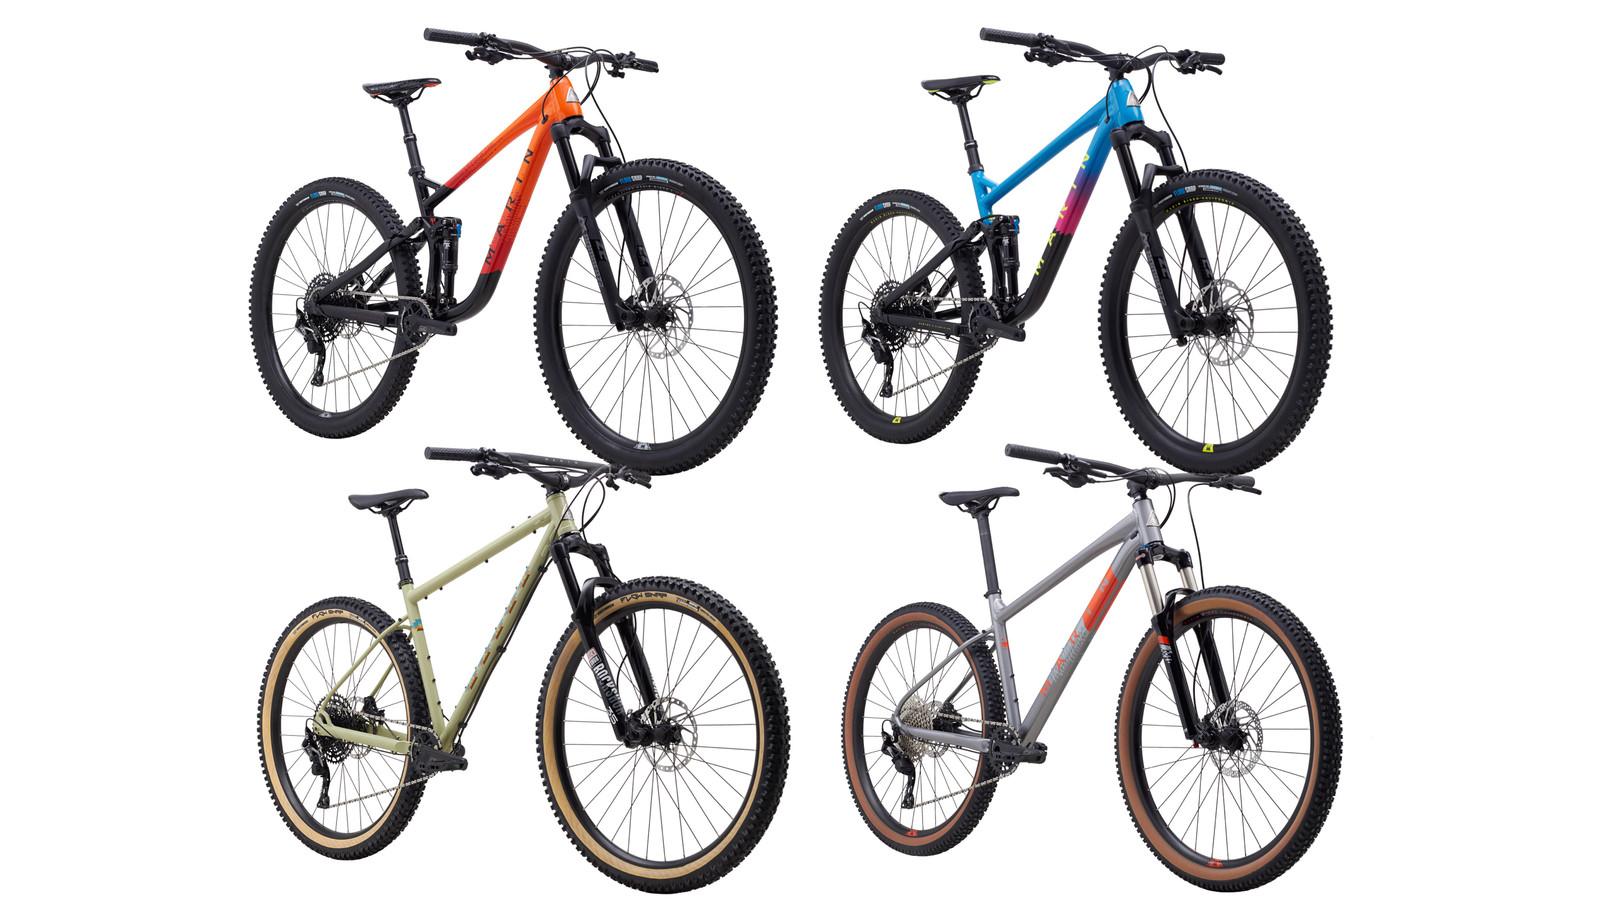 New 2020 Mountain Bikes from Marin